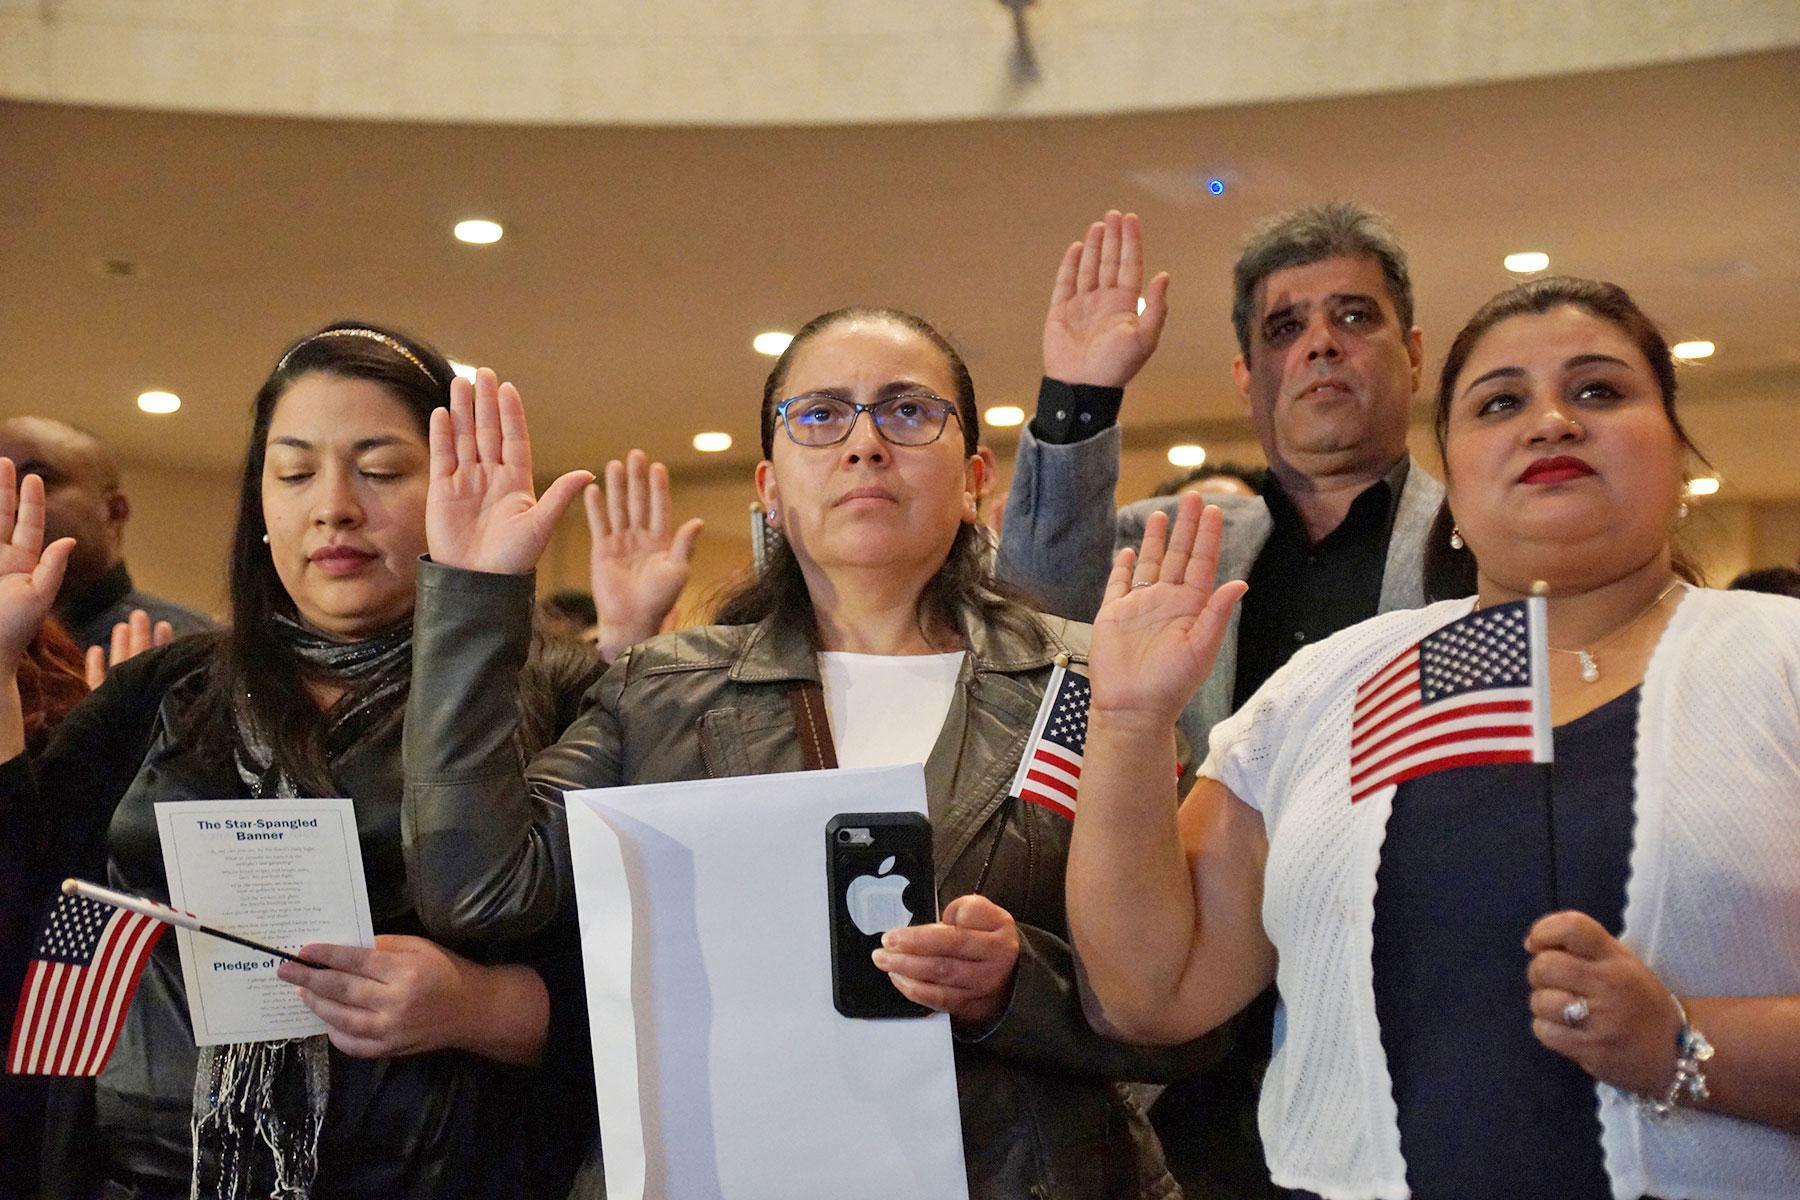 02_030818_citizenshipday_299